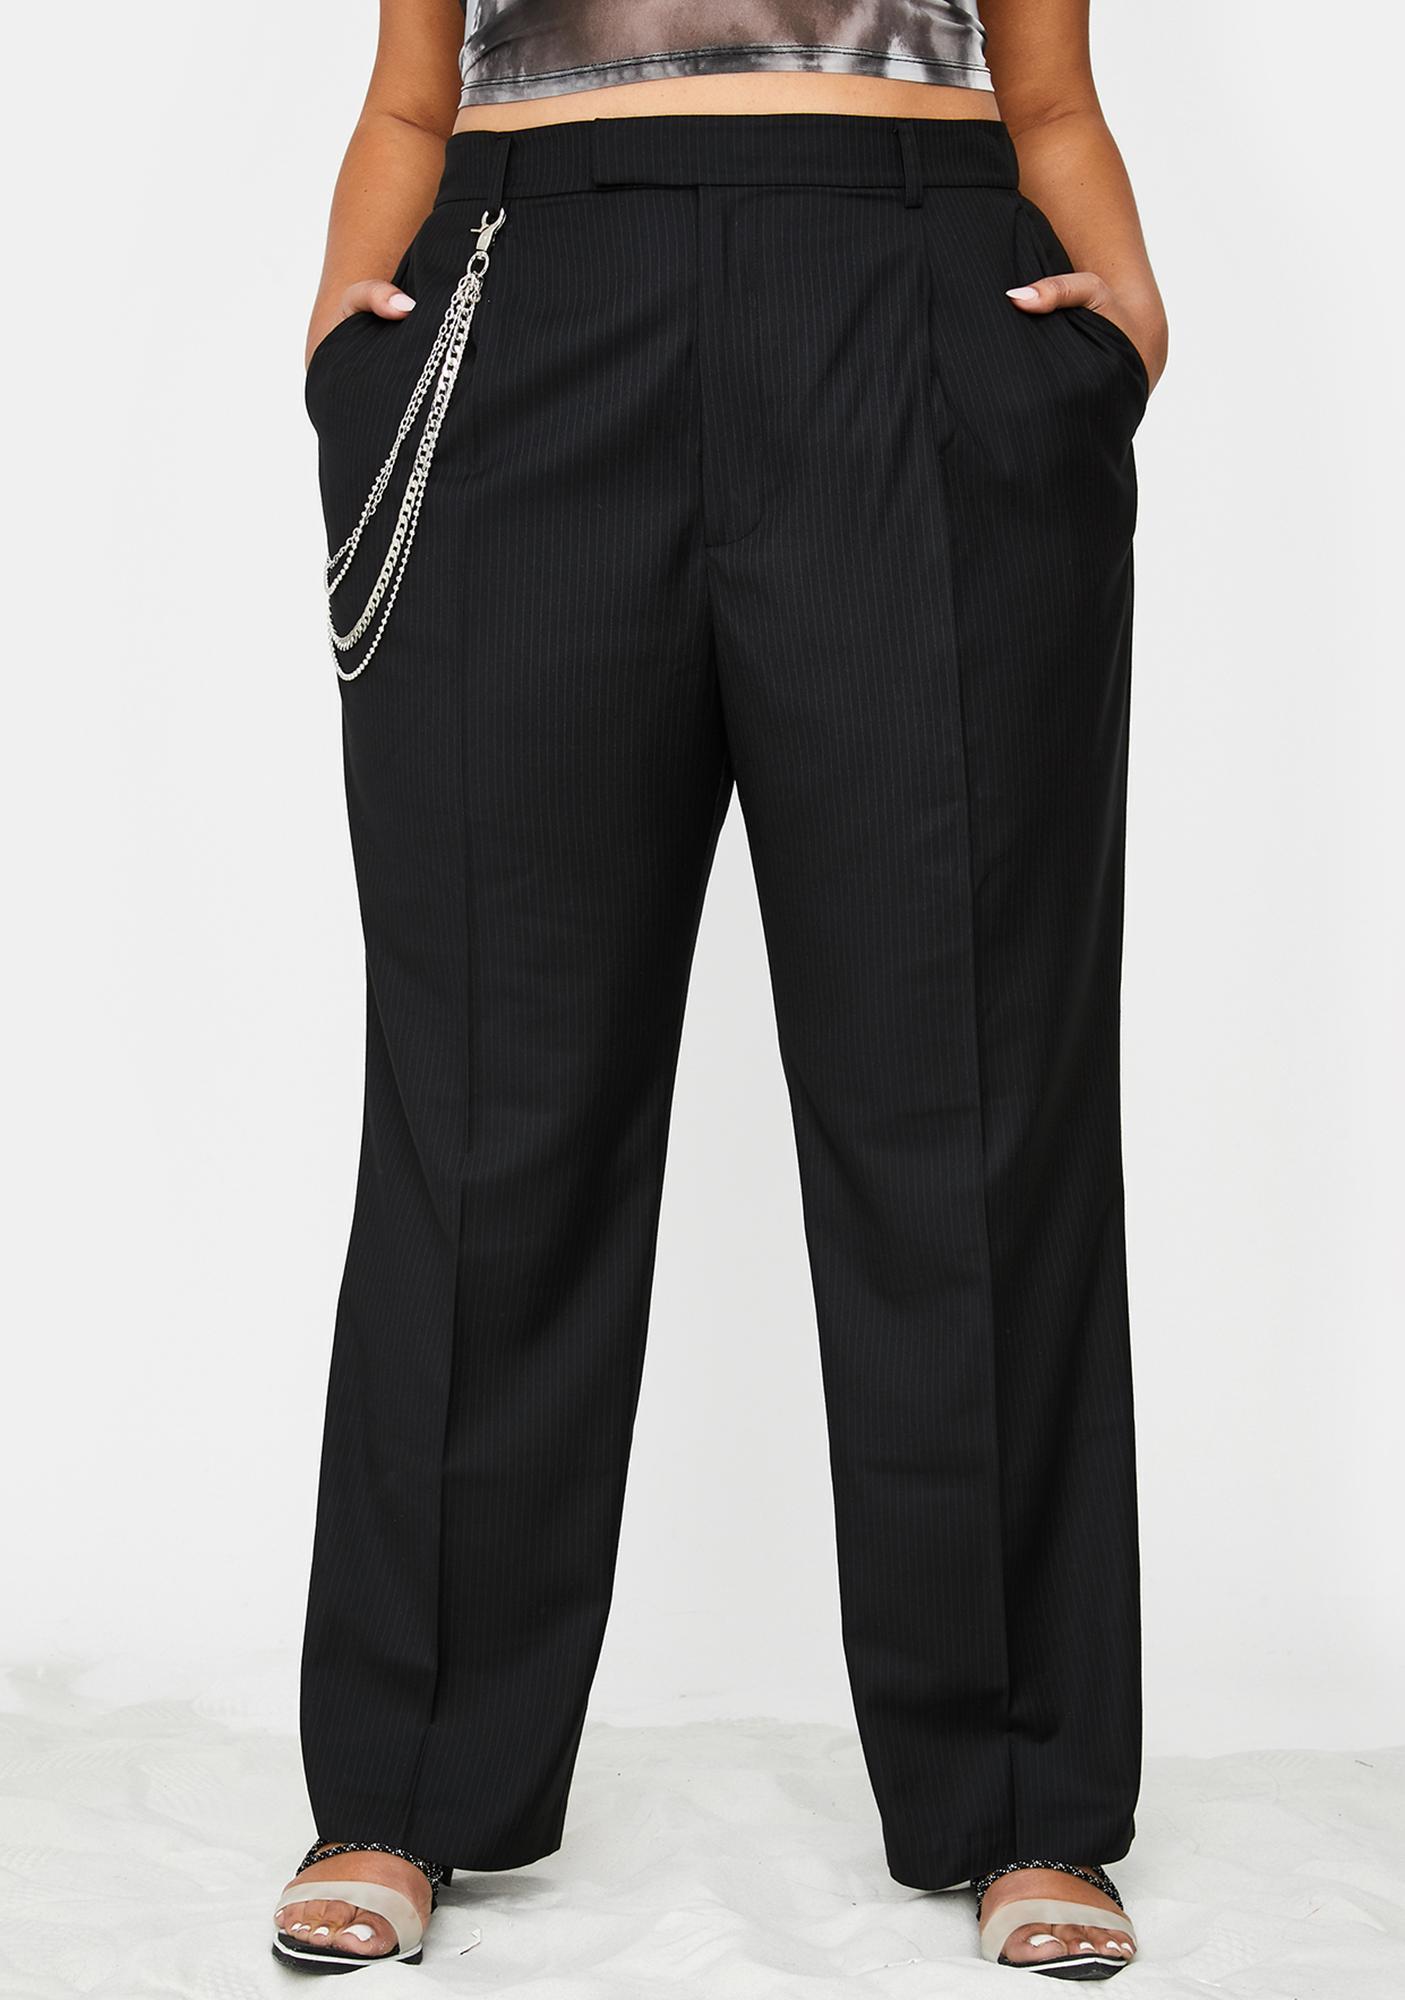 Poster Grl Too Suited For Werk Pinstripe Trousers